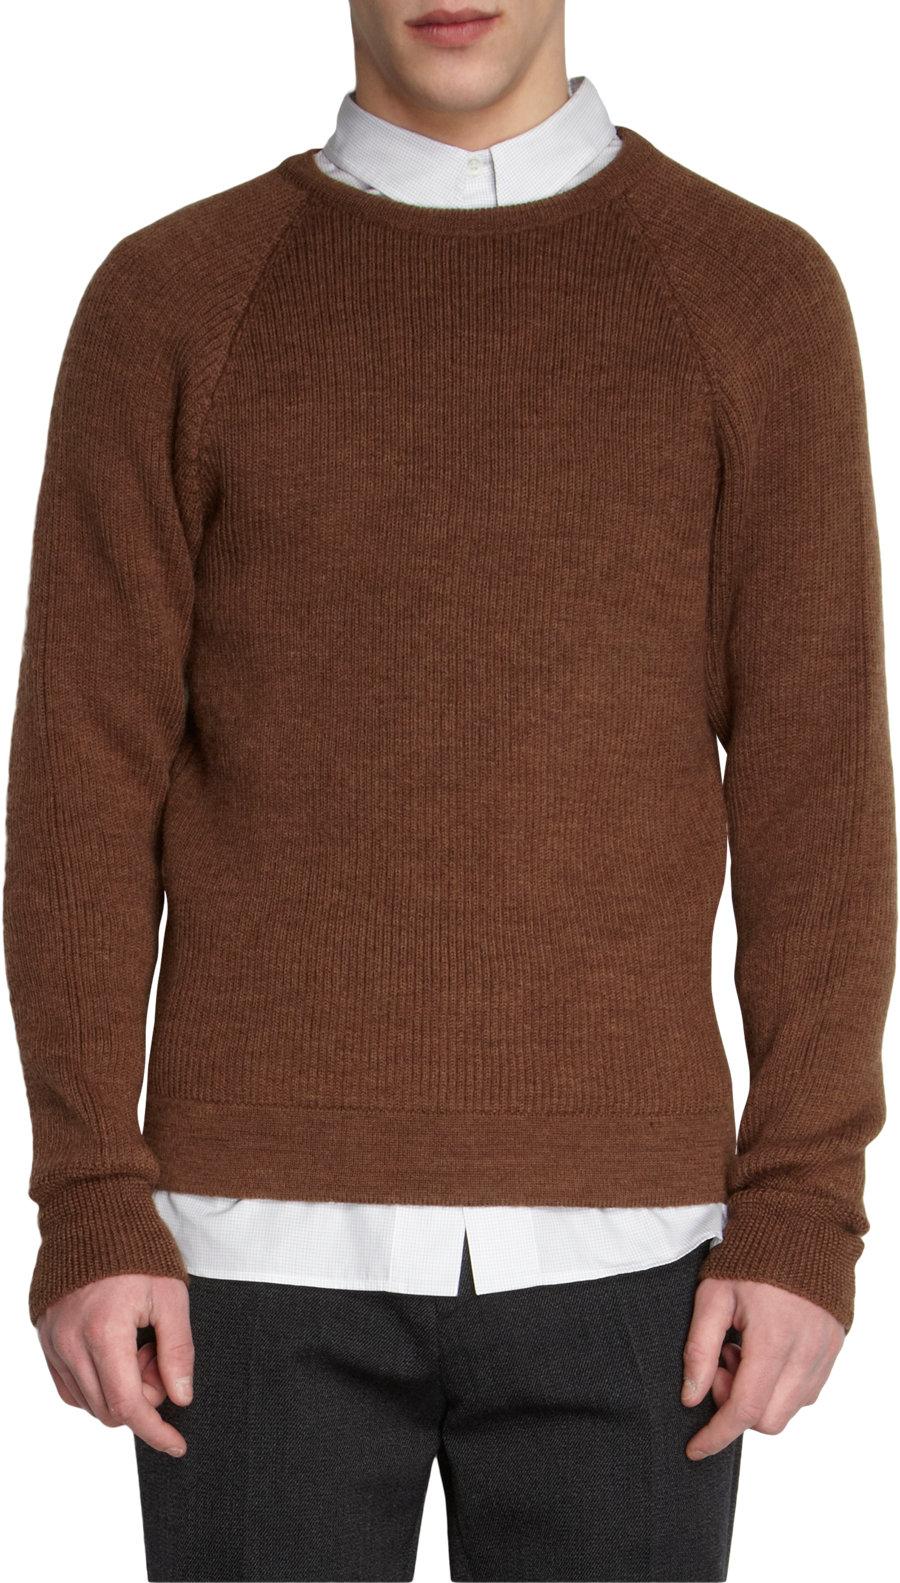 Thumbhole Sweater | Kids Jackets with Thumb Holes | Womens Shirts with Thumb Holes